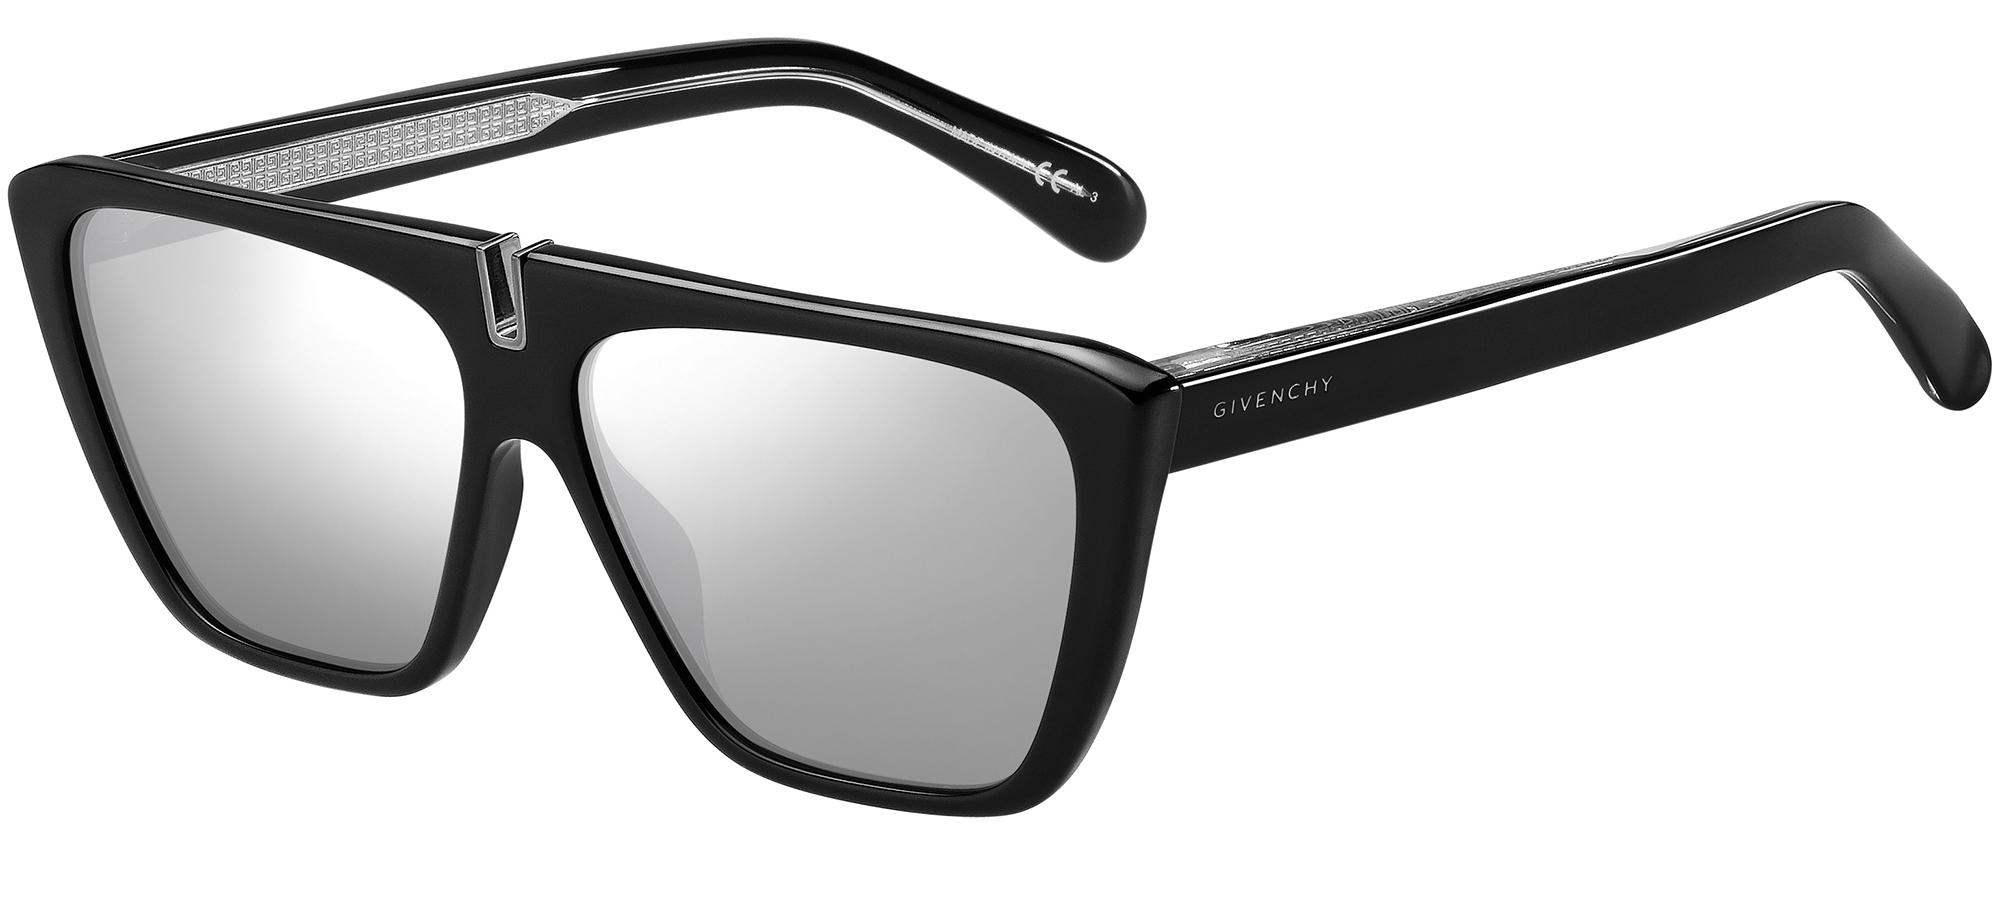 Givenchy Sunglasses GV-7109-S 8079O